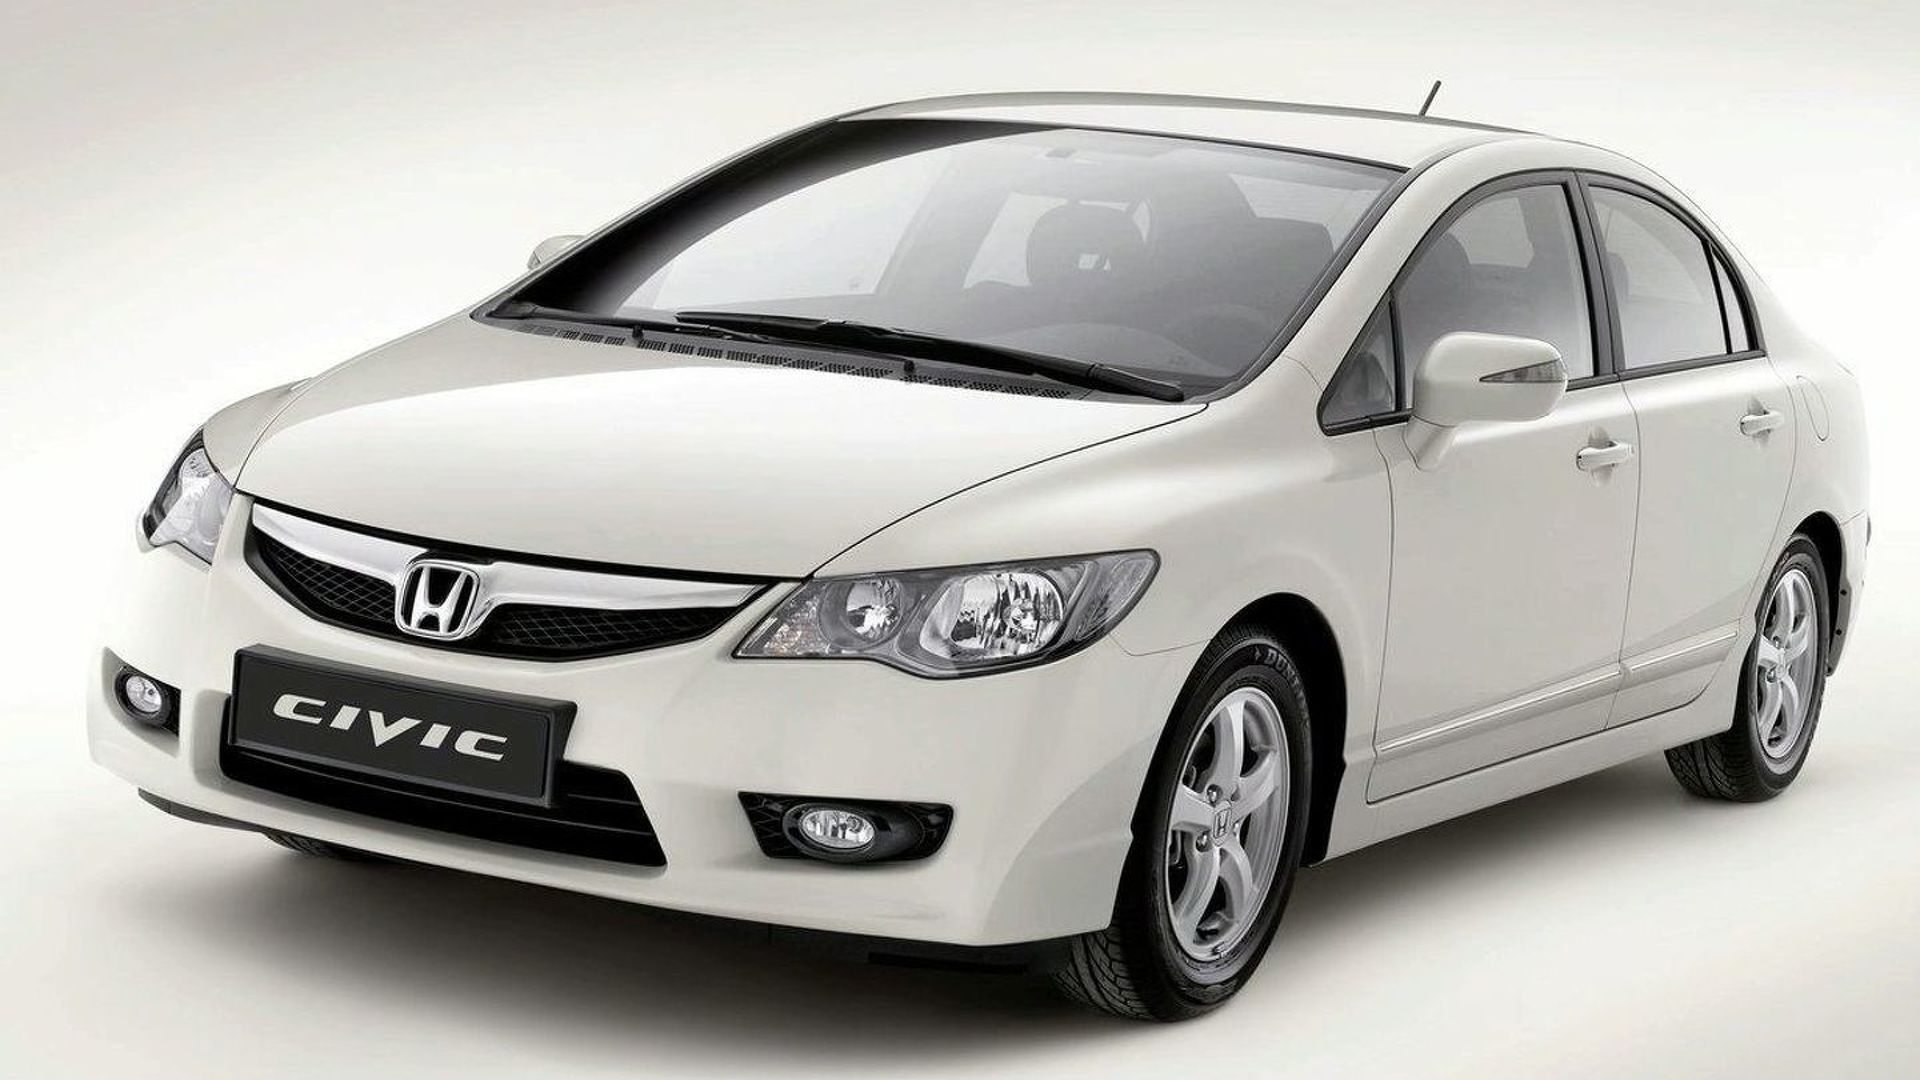 2009 Honda Civic Hybrid Facelift